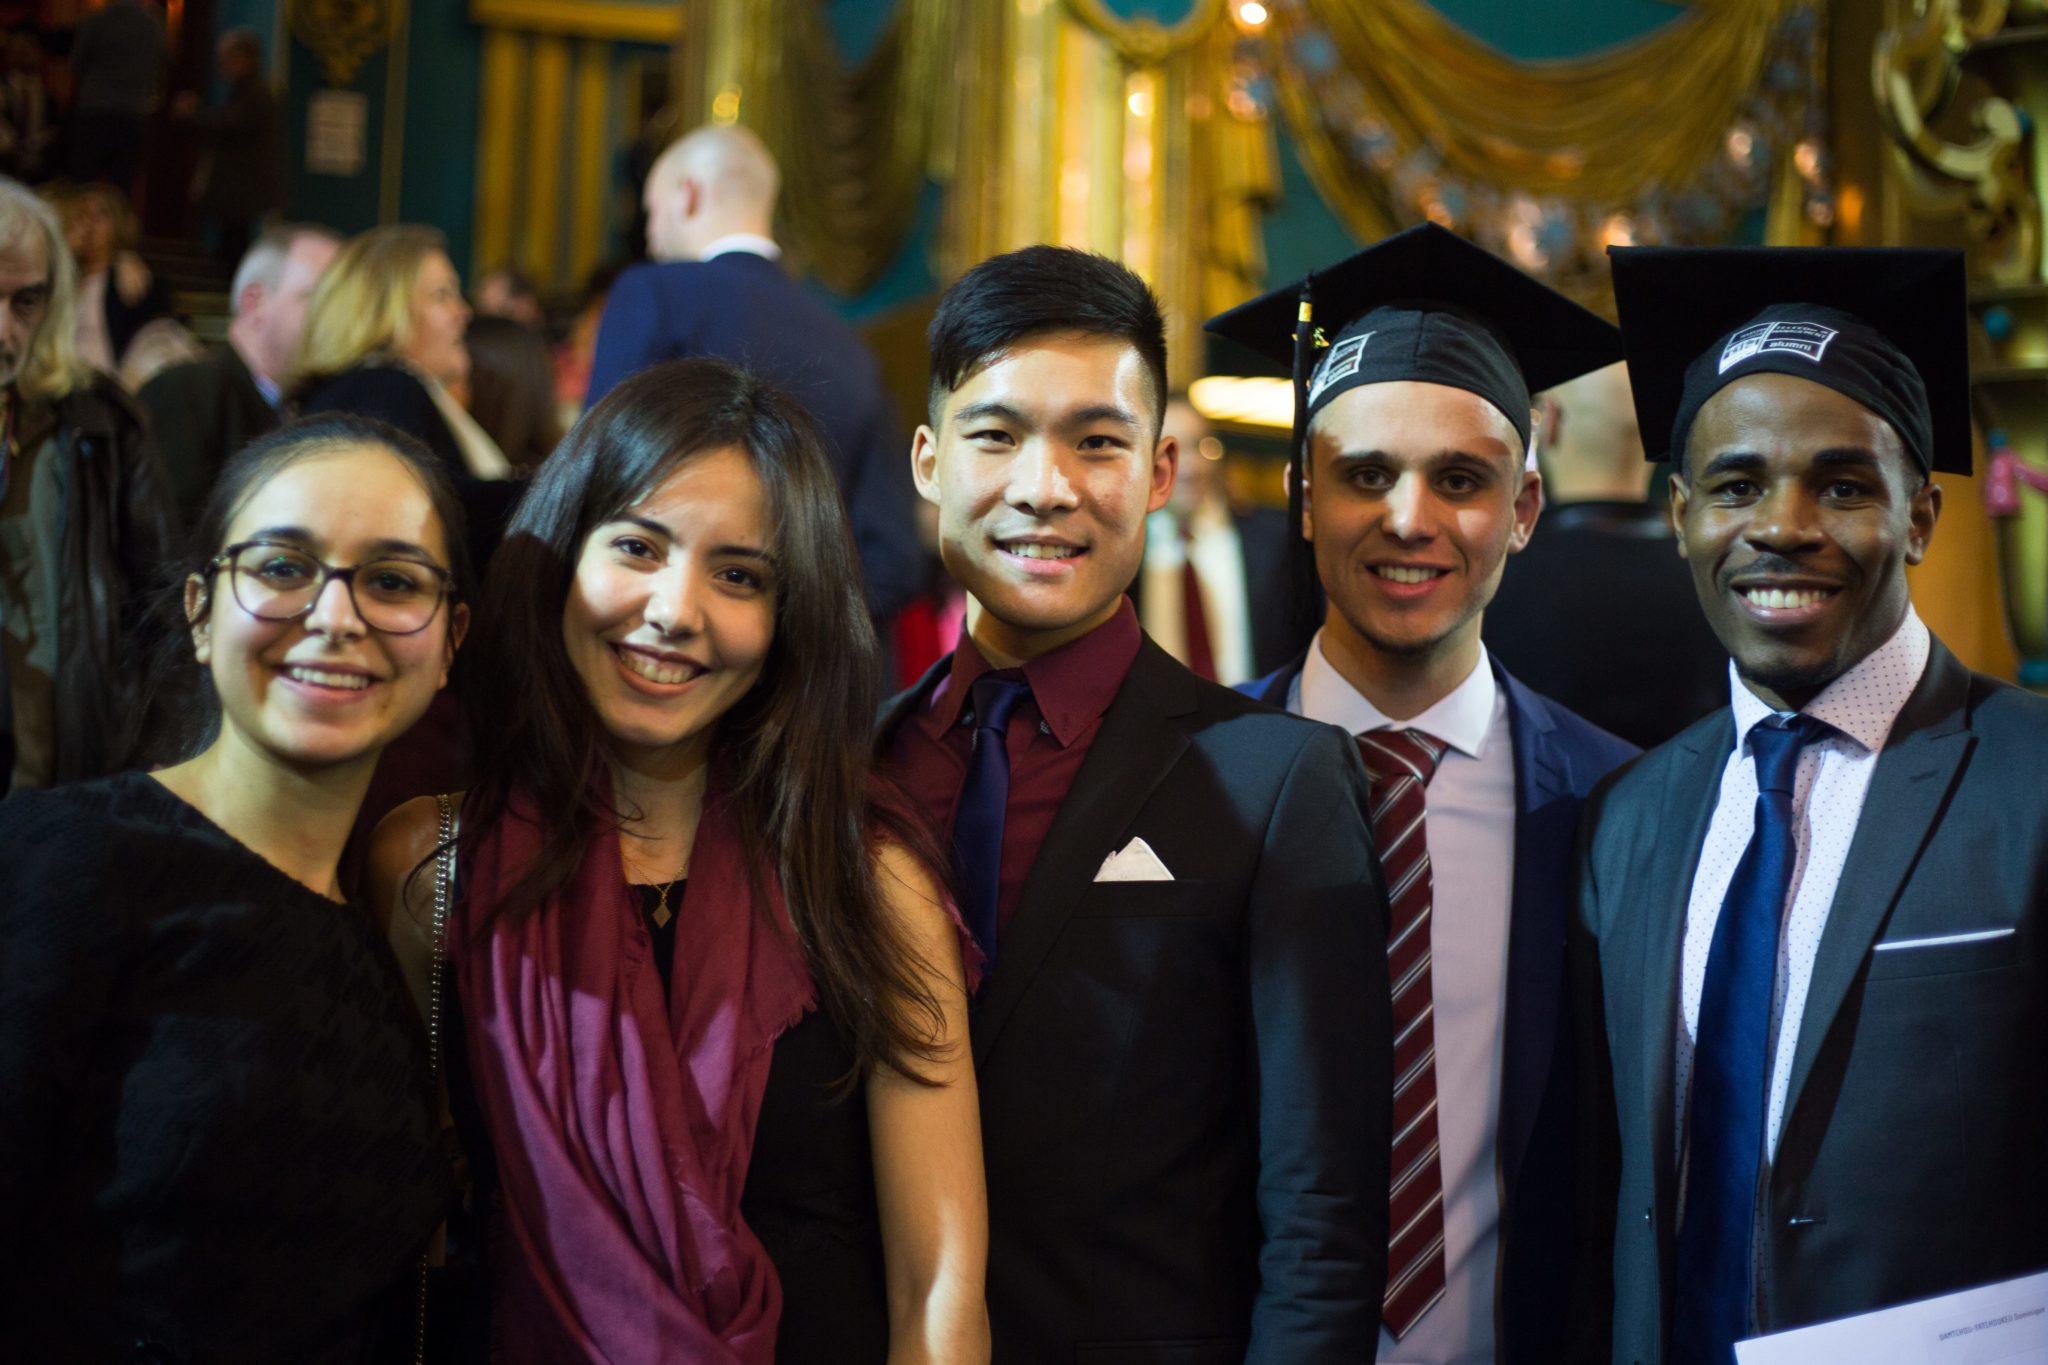 IMT_BS remise des diplomes (3)